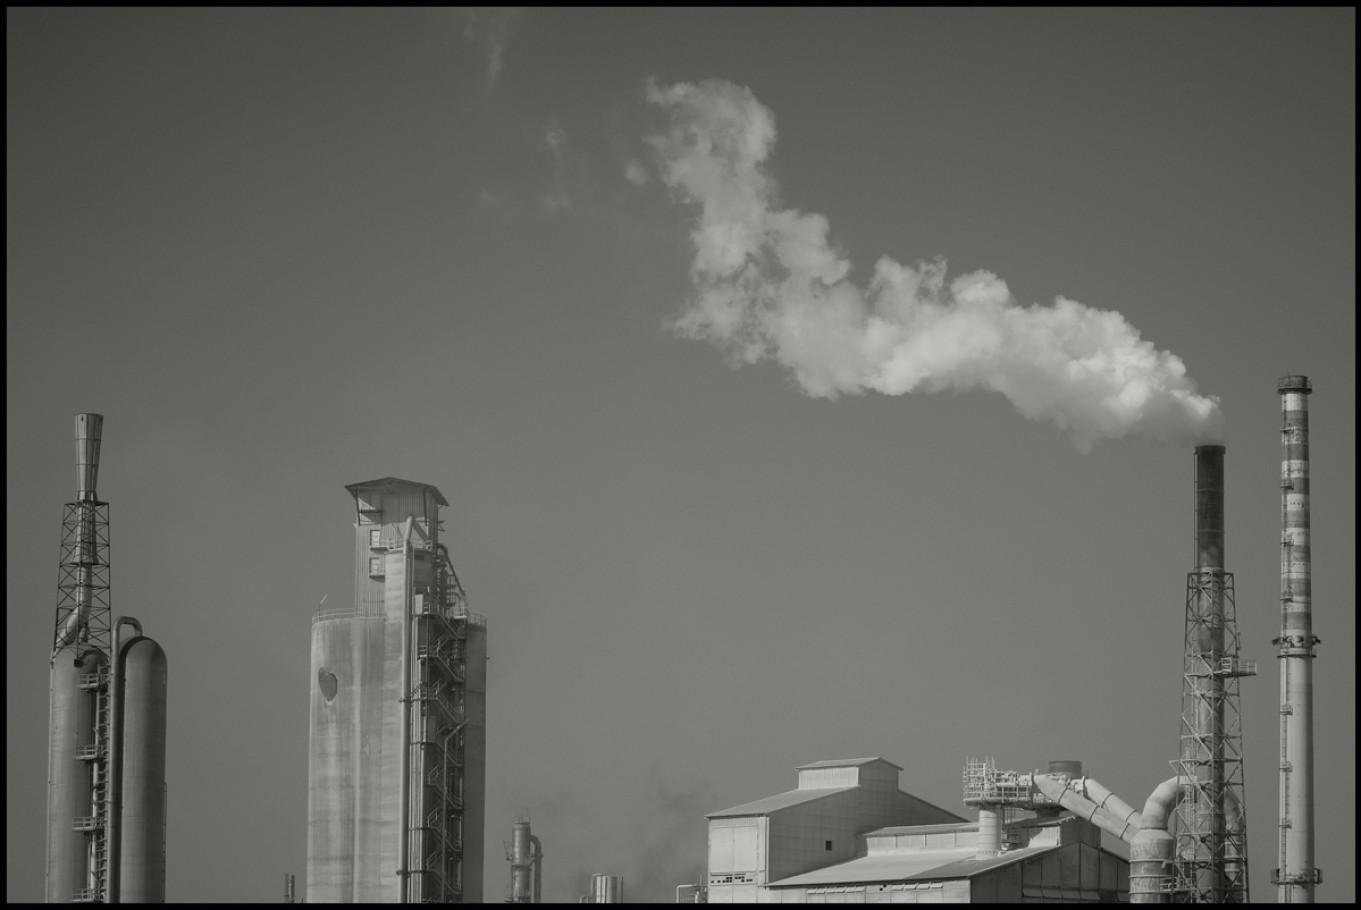 11 febbraio 2006, zona industriale